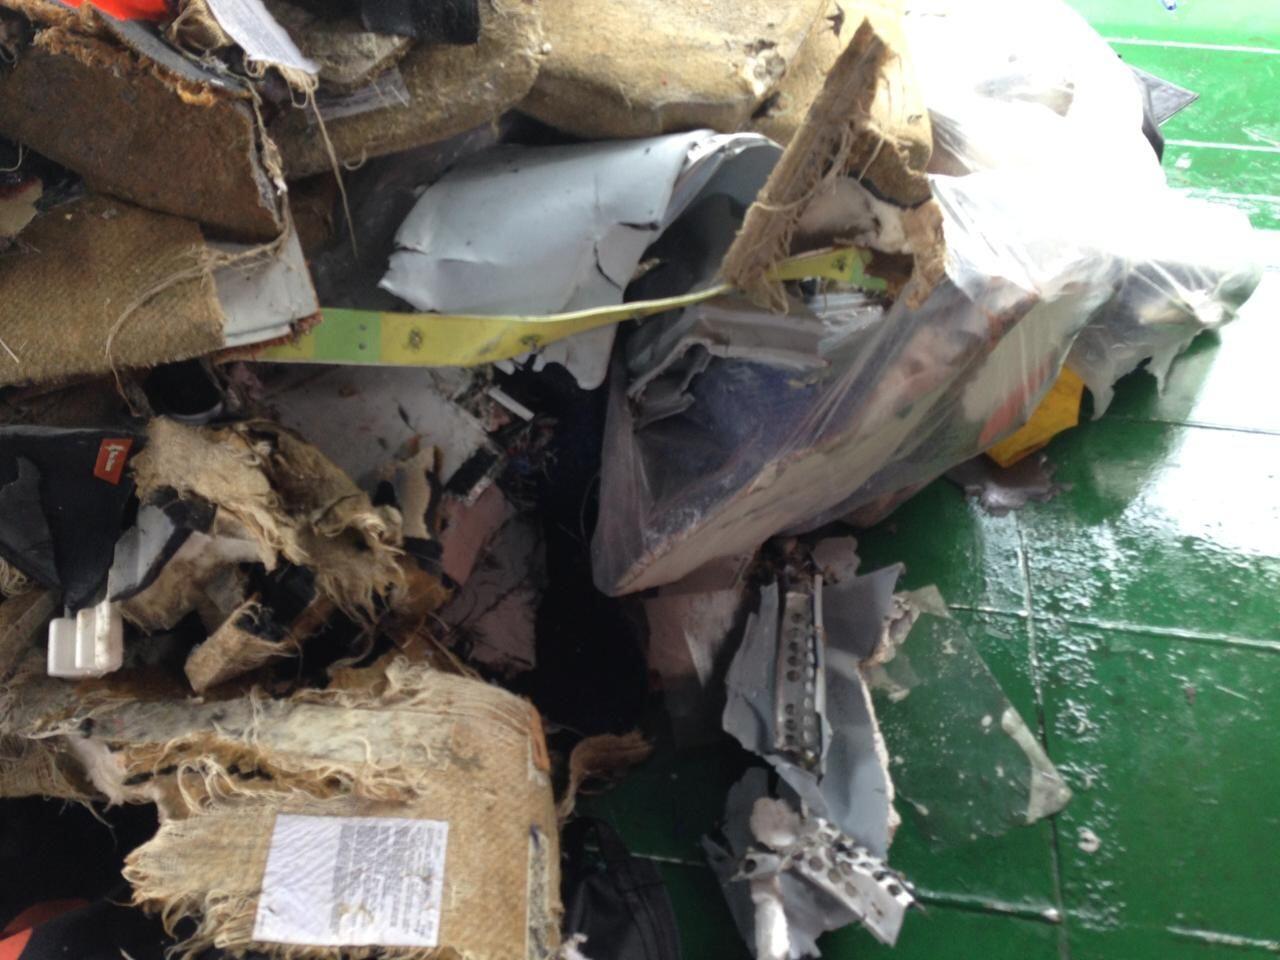 DVI Polri Ambil Sampel Barang dan Serpihan Tubuh Korban Lion Air